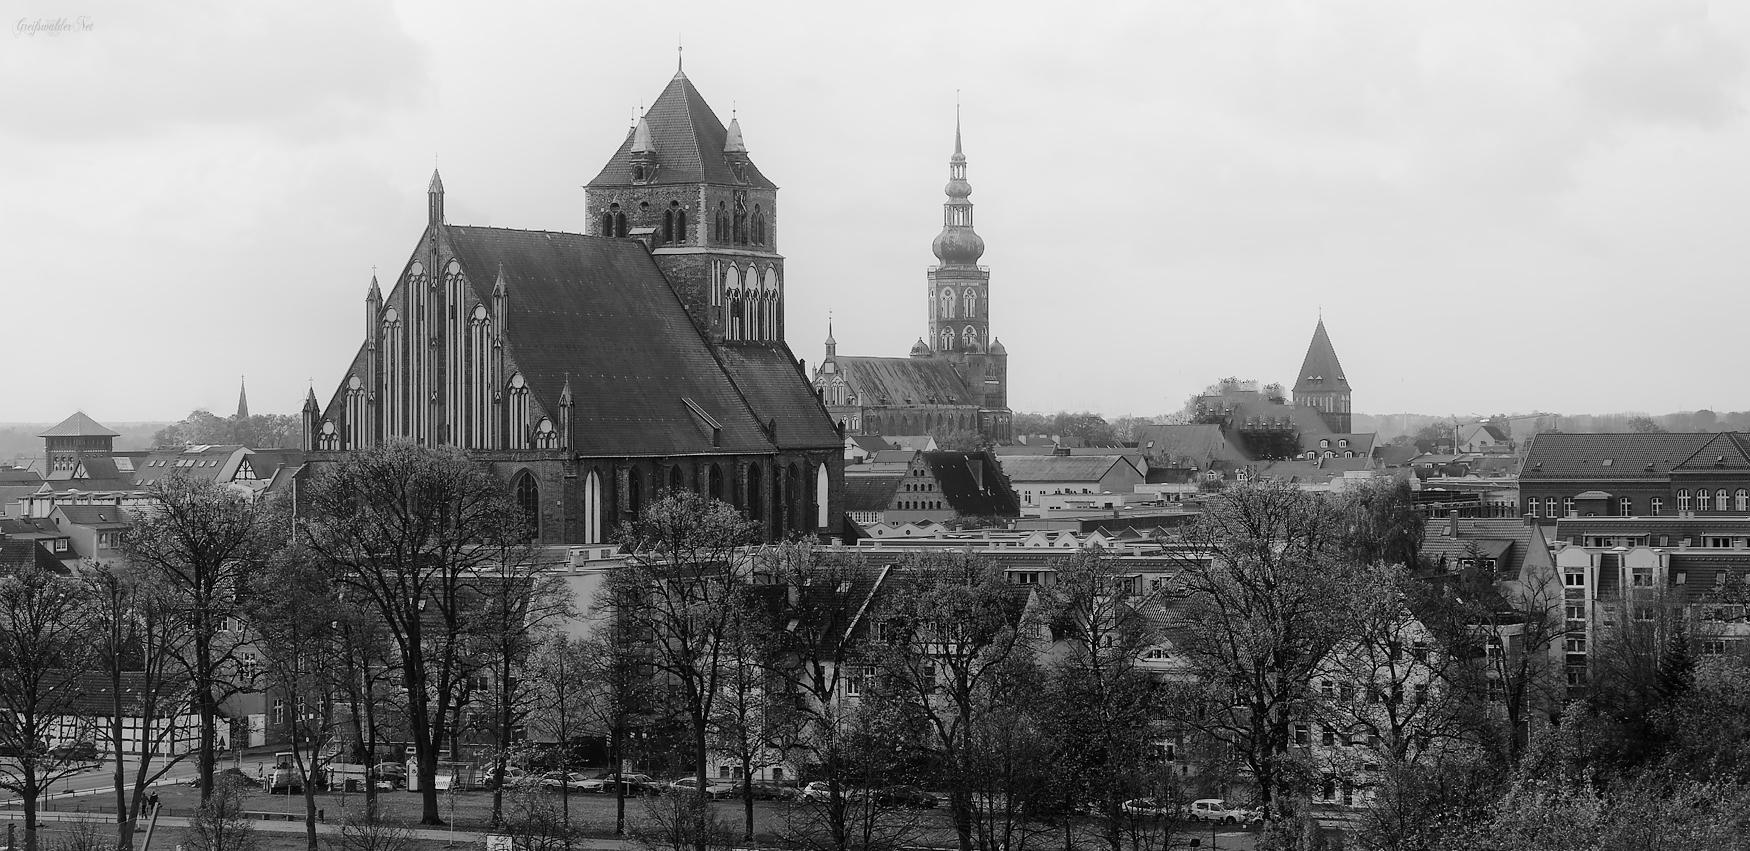 Marienkirche, Dom St. Nikolai und St. Jakobikirche in Greifswald